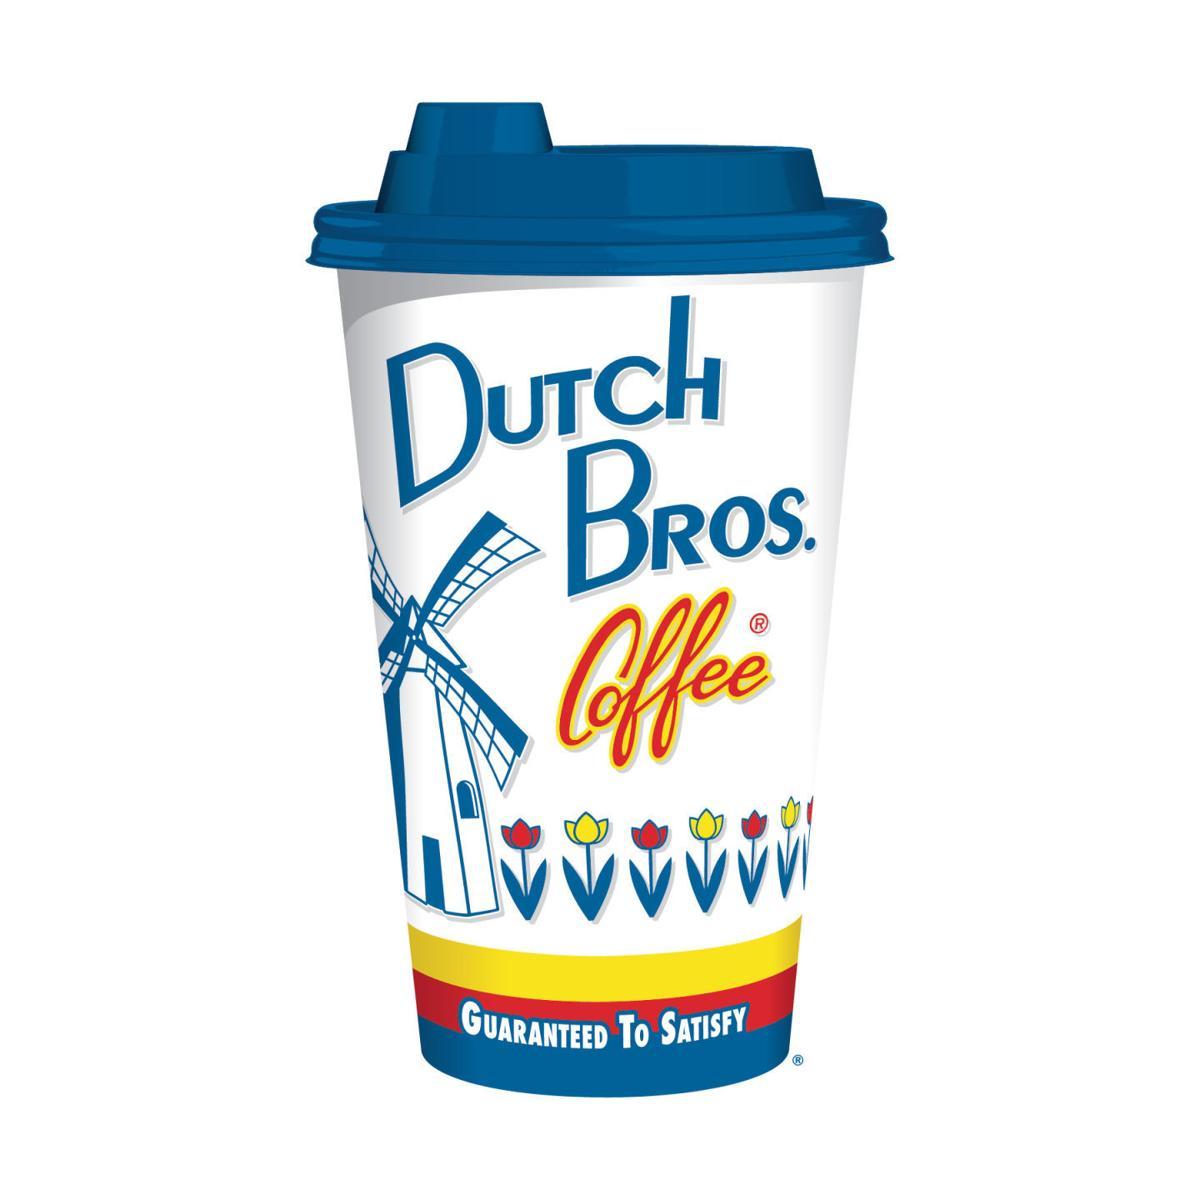 dutch bros to raise donatations for food boxes southern beer mug clip art free beer mug clip art free